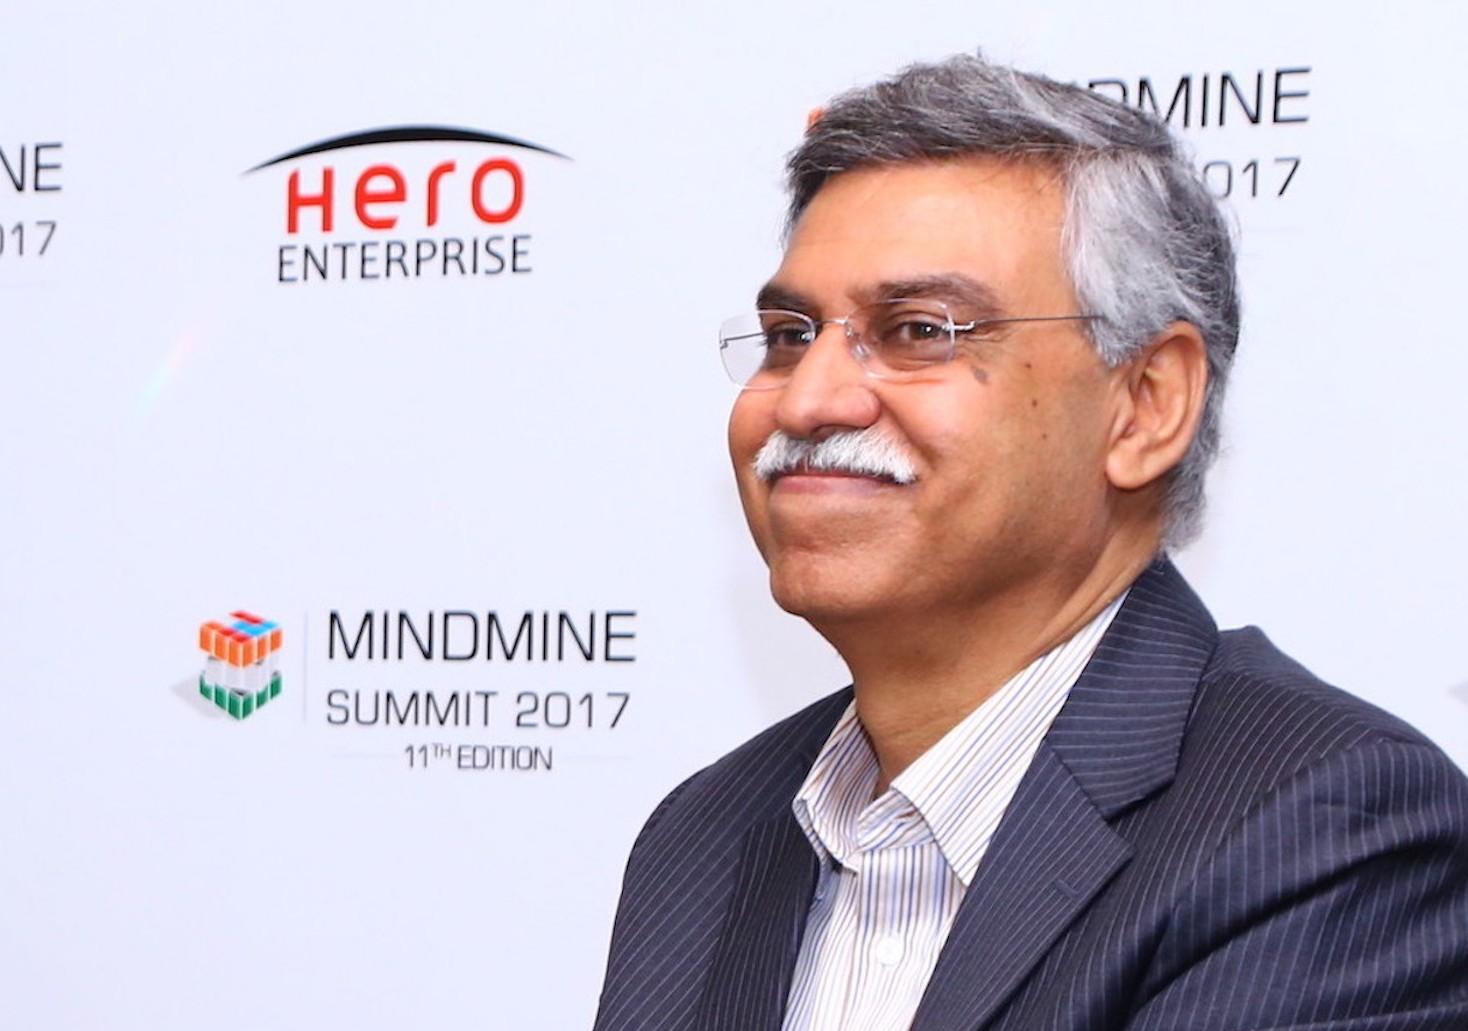 Diwali Season Sales of Hero MotoCorp Crossed 14 Lakh Units